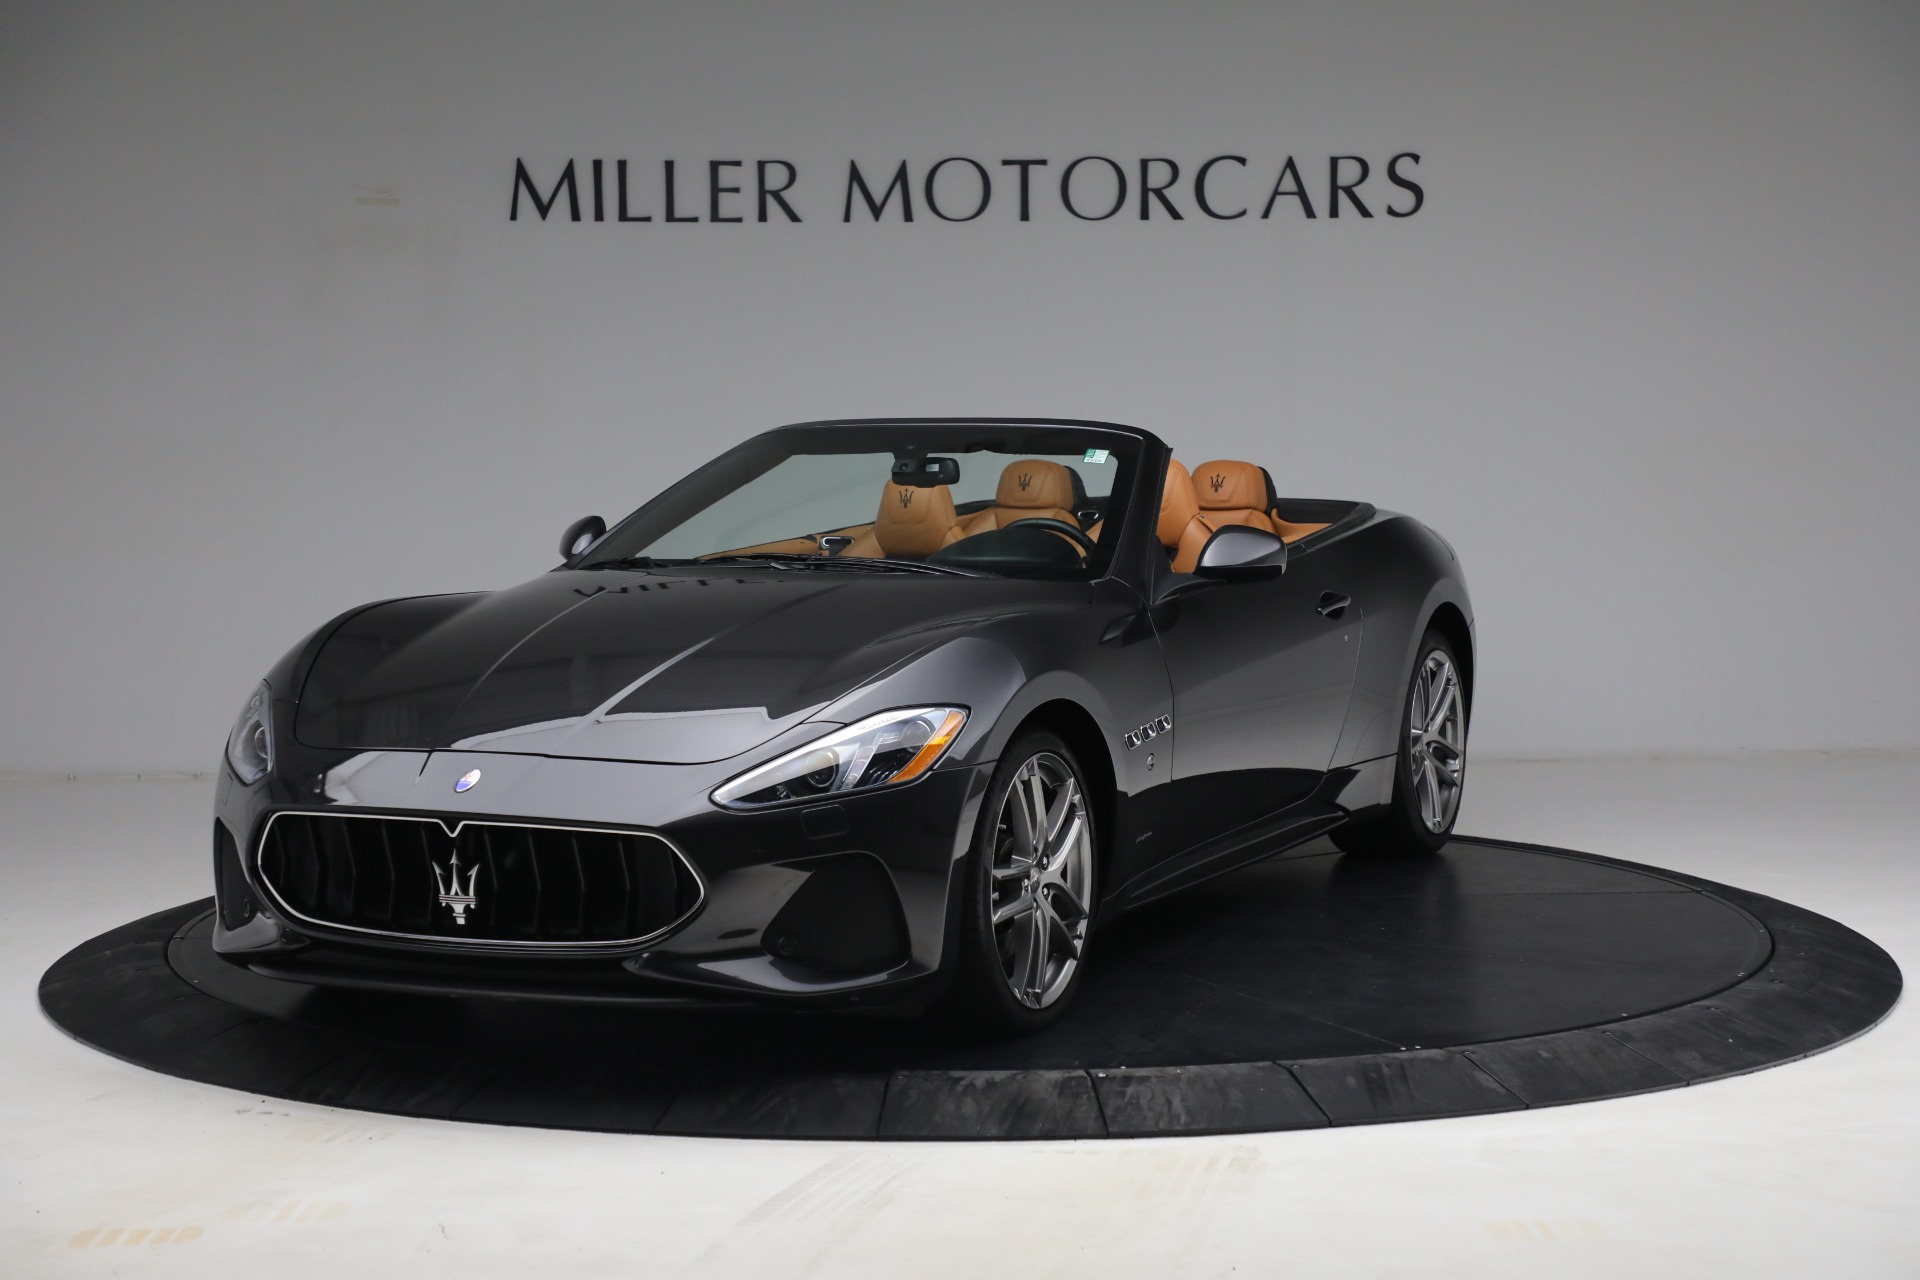 2018 Maserati GranTurismo Sport Stock M2103 for sale near Westport